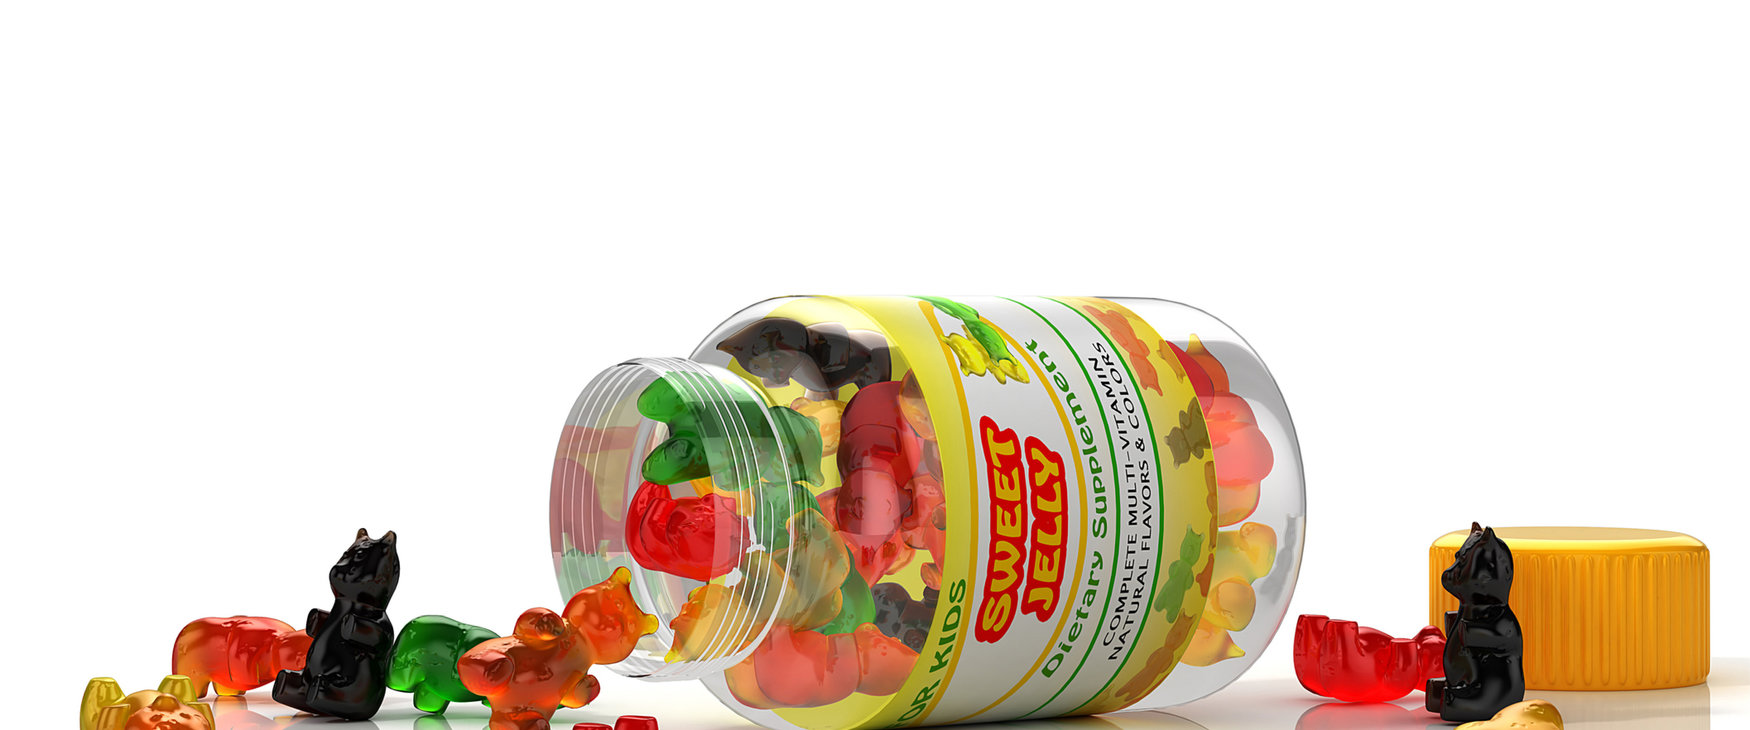 [Translate to Spanish:] Vimanin gummies with Rousselot SiMoGel